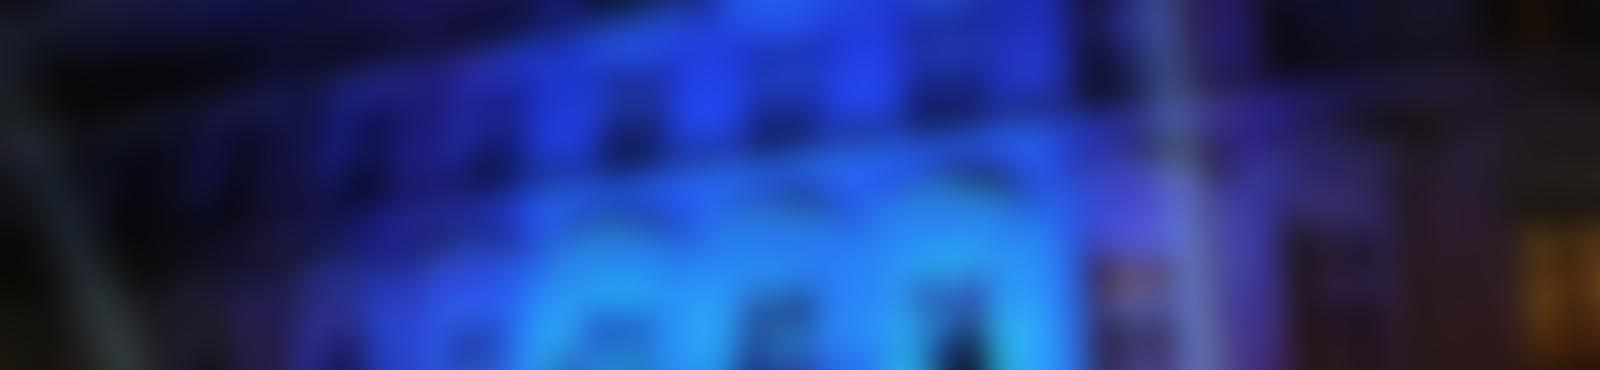 Blurred 26af8d71 63c6 4e70 8e29 995ddcd7d0b8